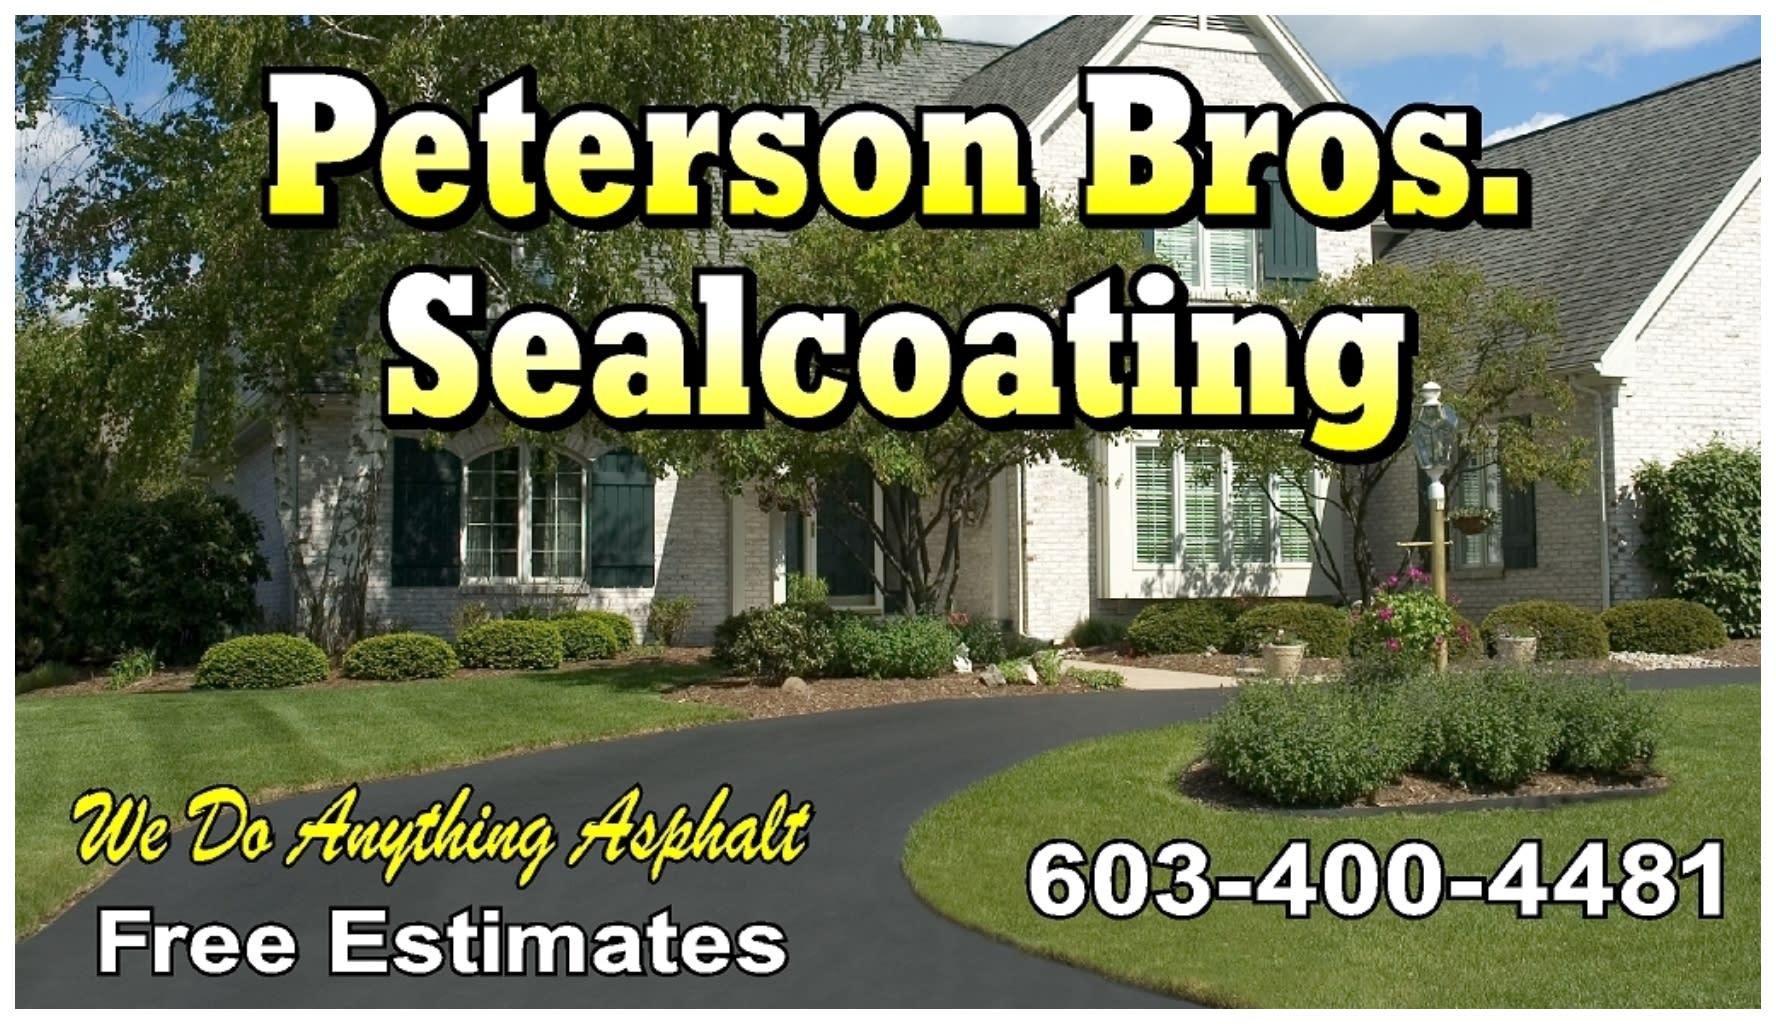 Peterson Bros Sealcoating